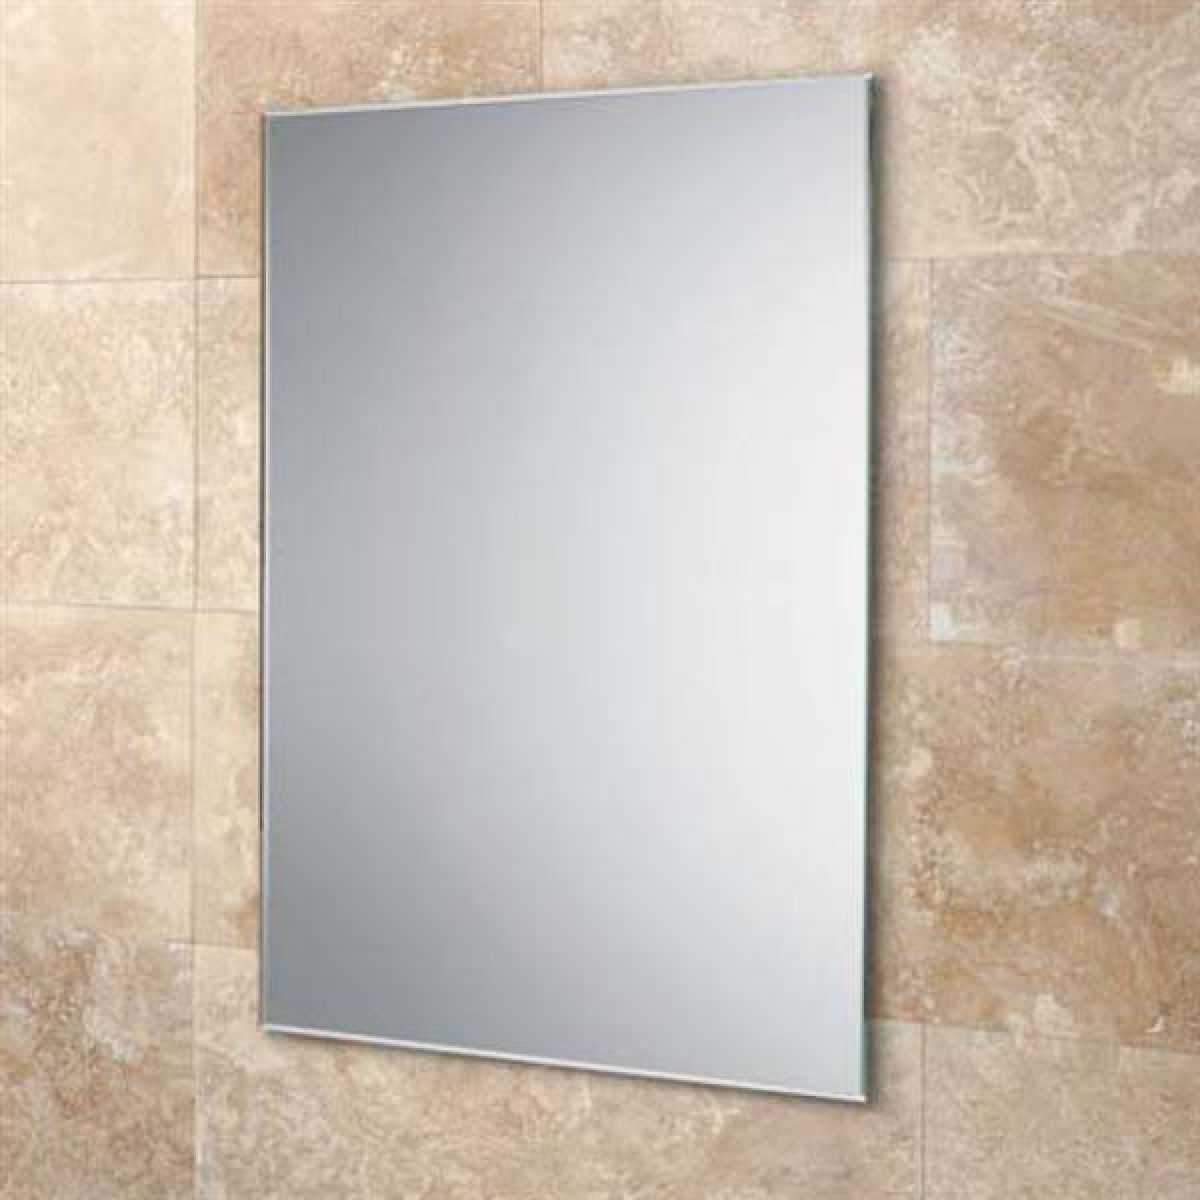 HiB Johnson Bathroom Mirror